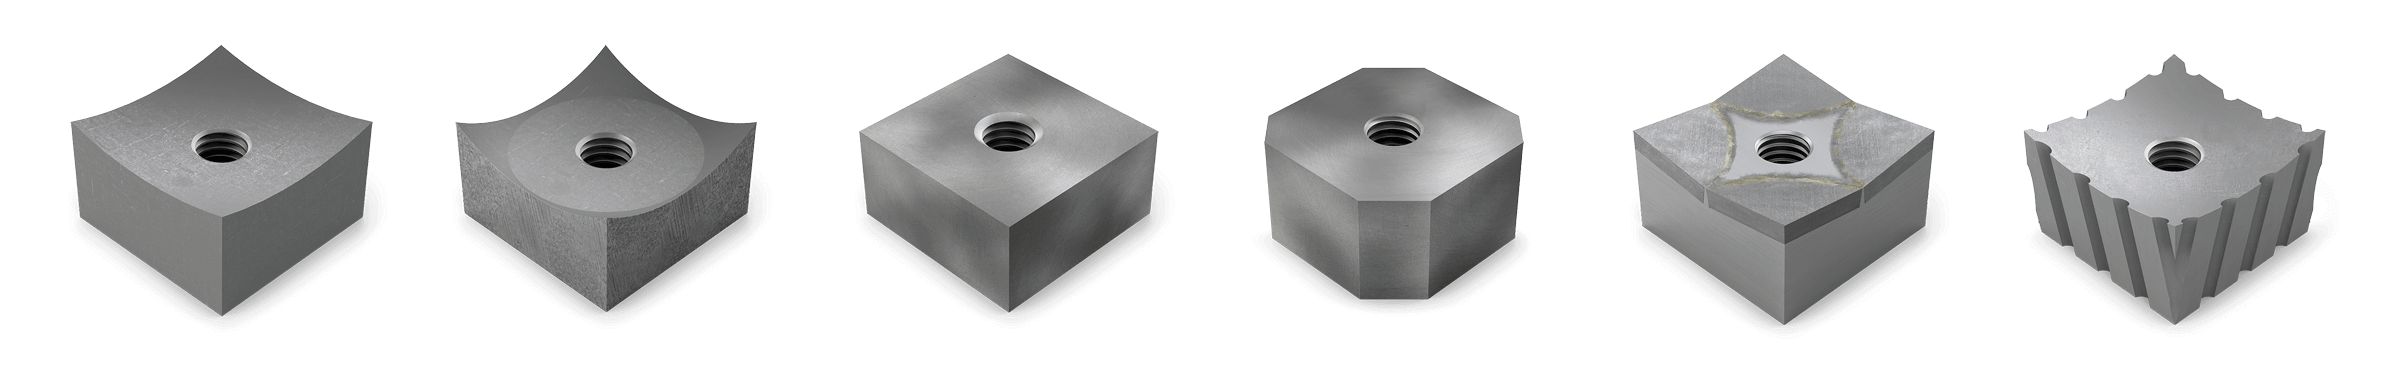 WEIMA rotor knives designs for different shredding tasks